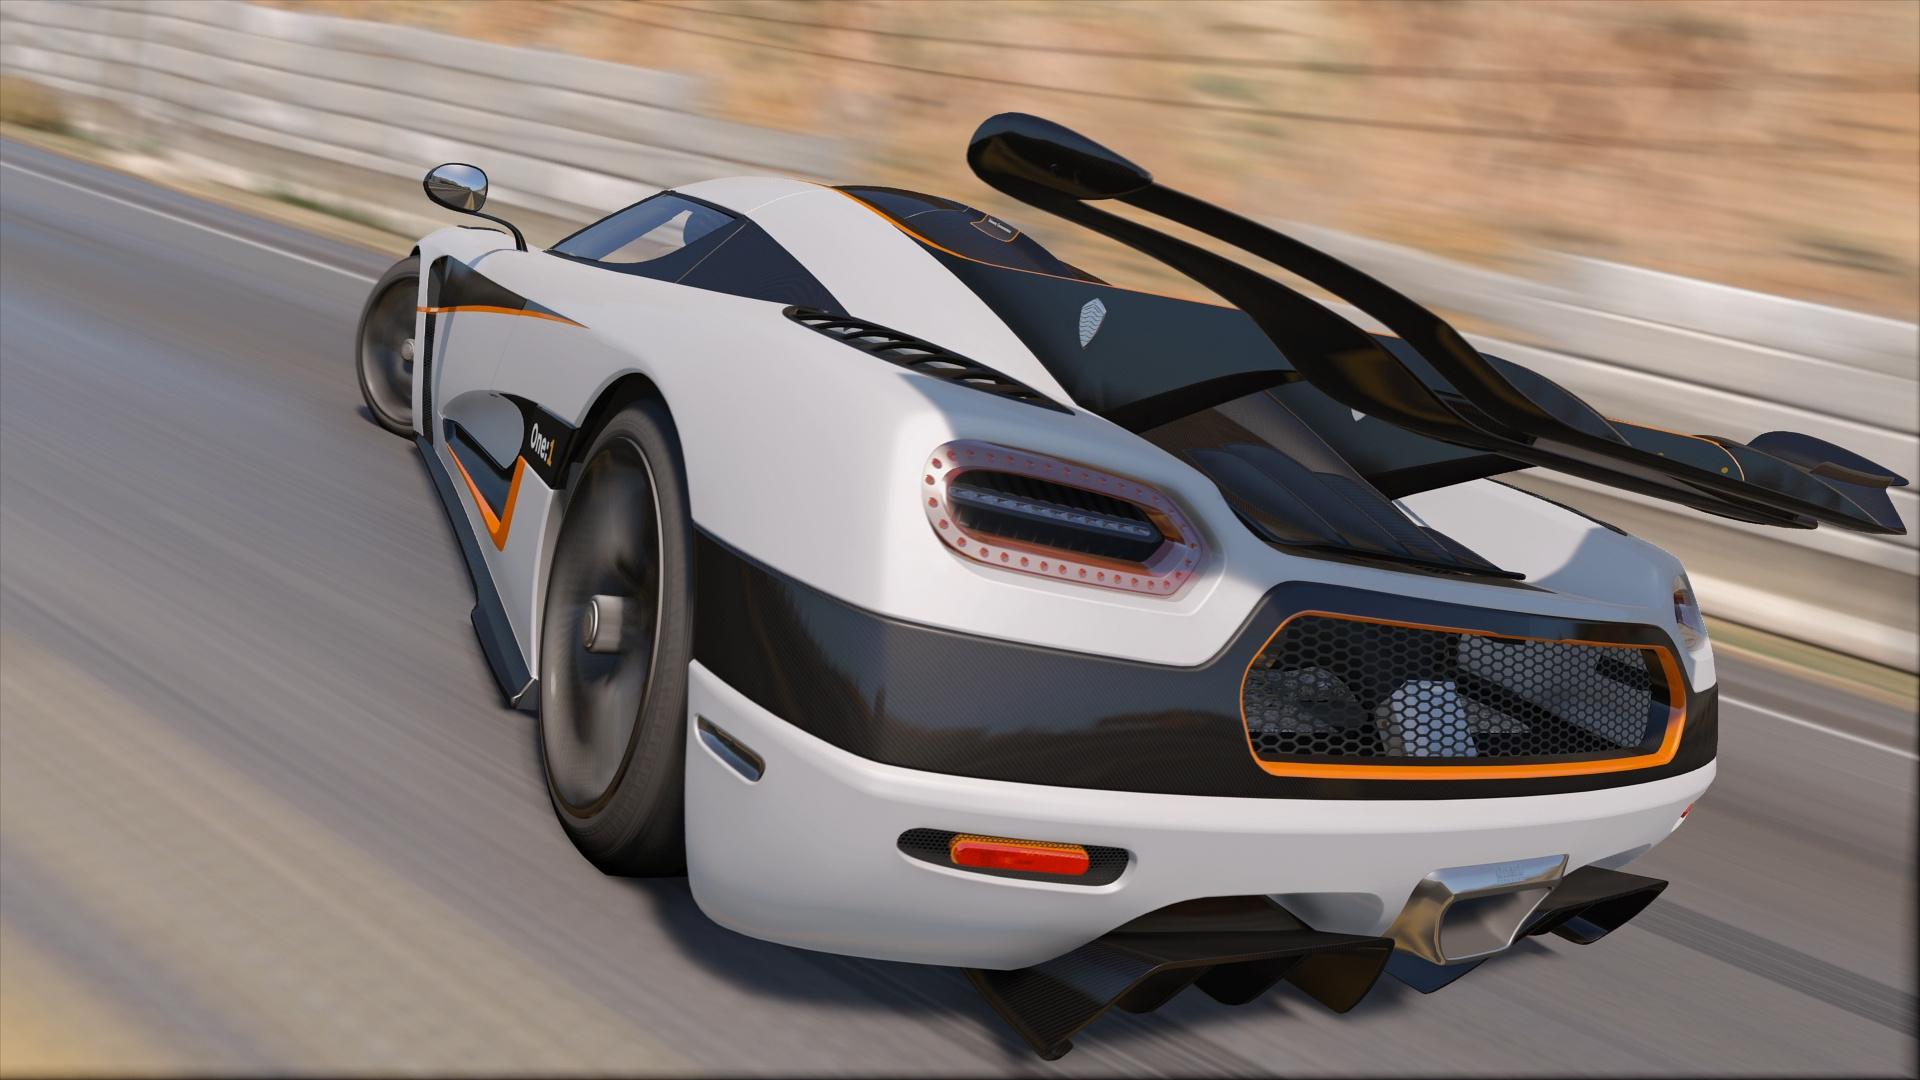 2015 Koenigsegg Agera One 1 Add On Dials Spyder Animated